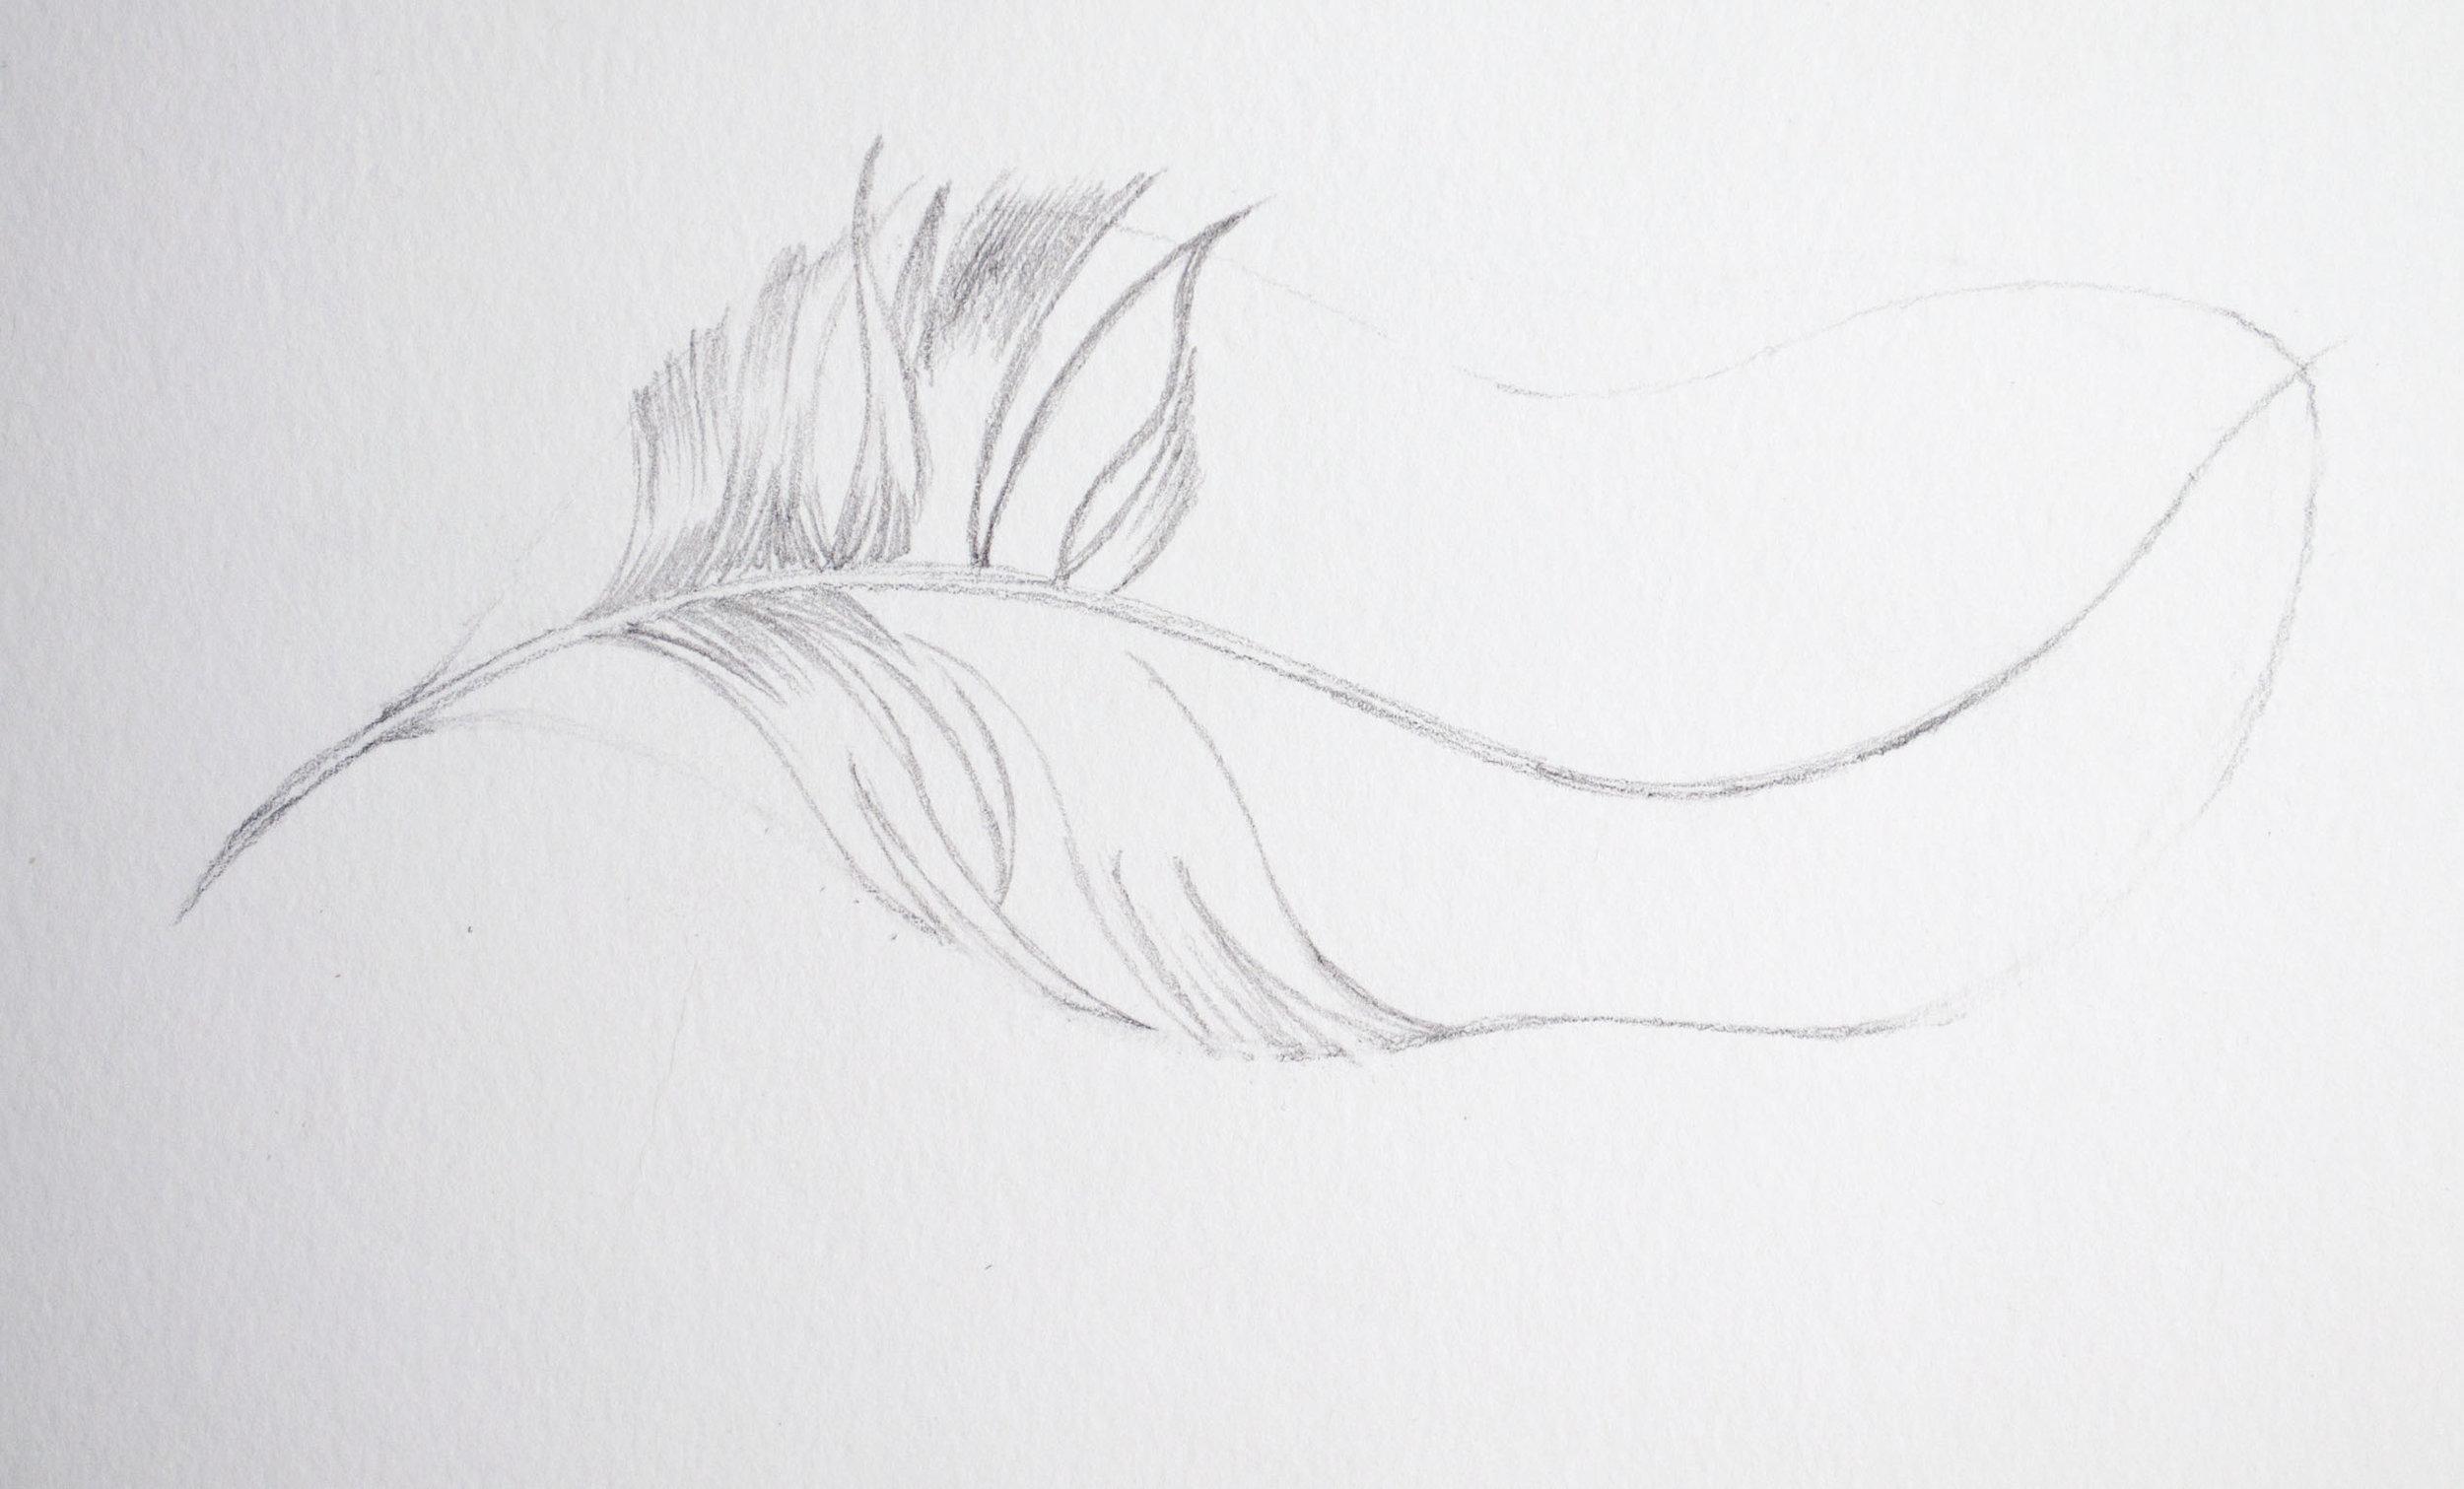 Caran DAche Feather Image 2.jpg